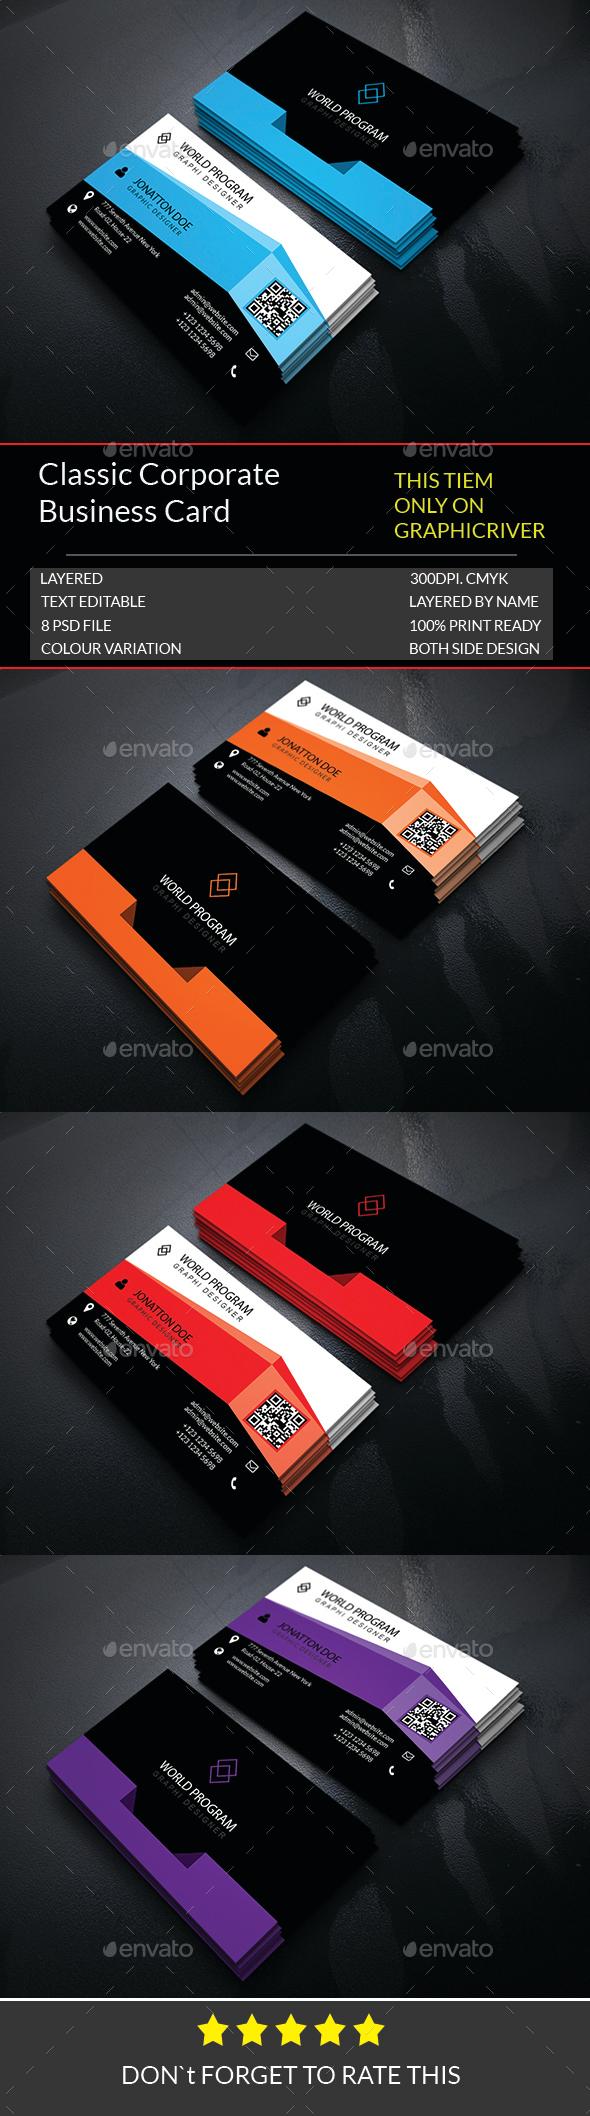 Classic Corporate Business Card Template.214 - Corporate Business Cards